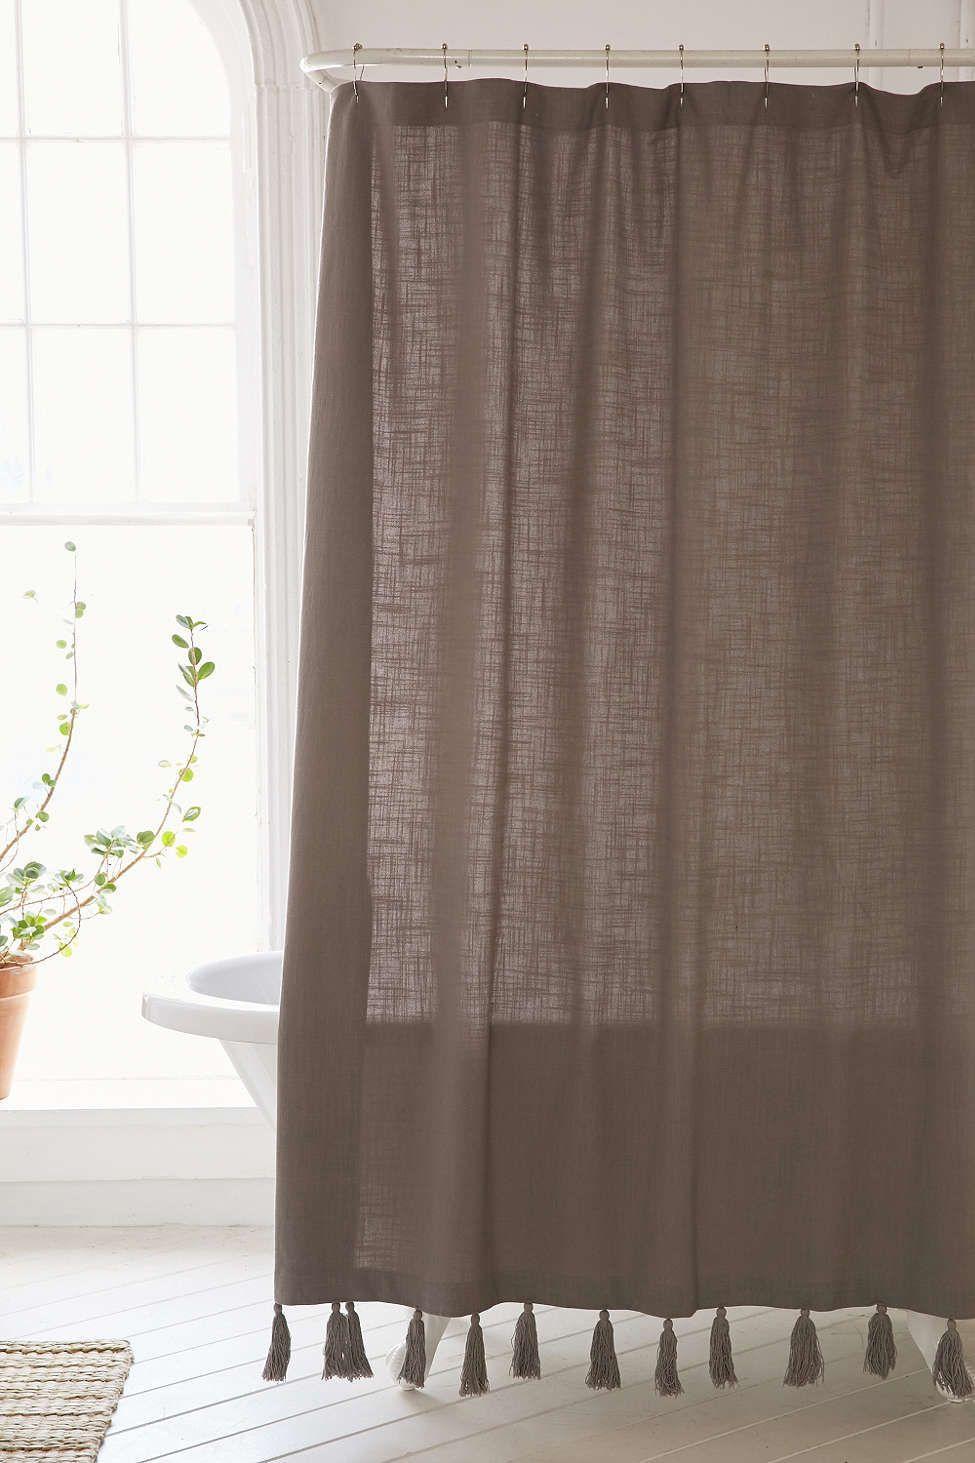 Plum Bow Tassel Fringe Shower Curtain Urban Outfitters Cortinas De Ducha Decoracion Cortinas Cortinas De Bano